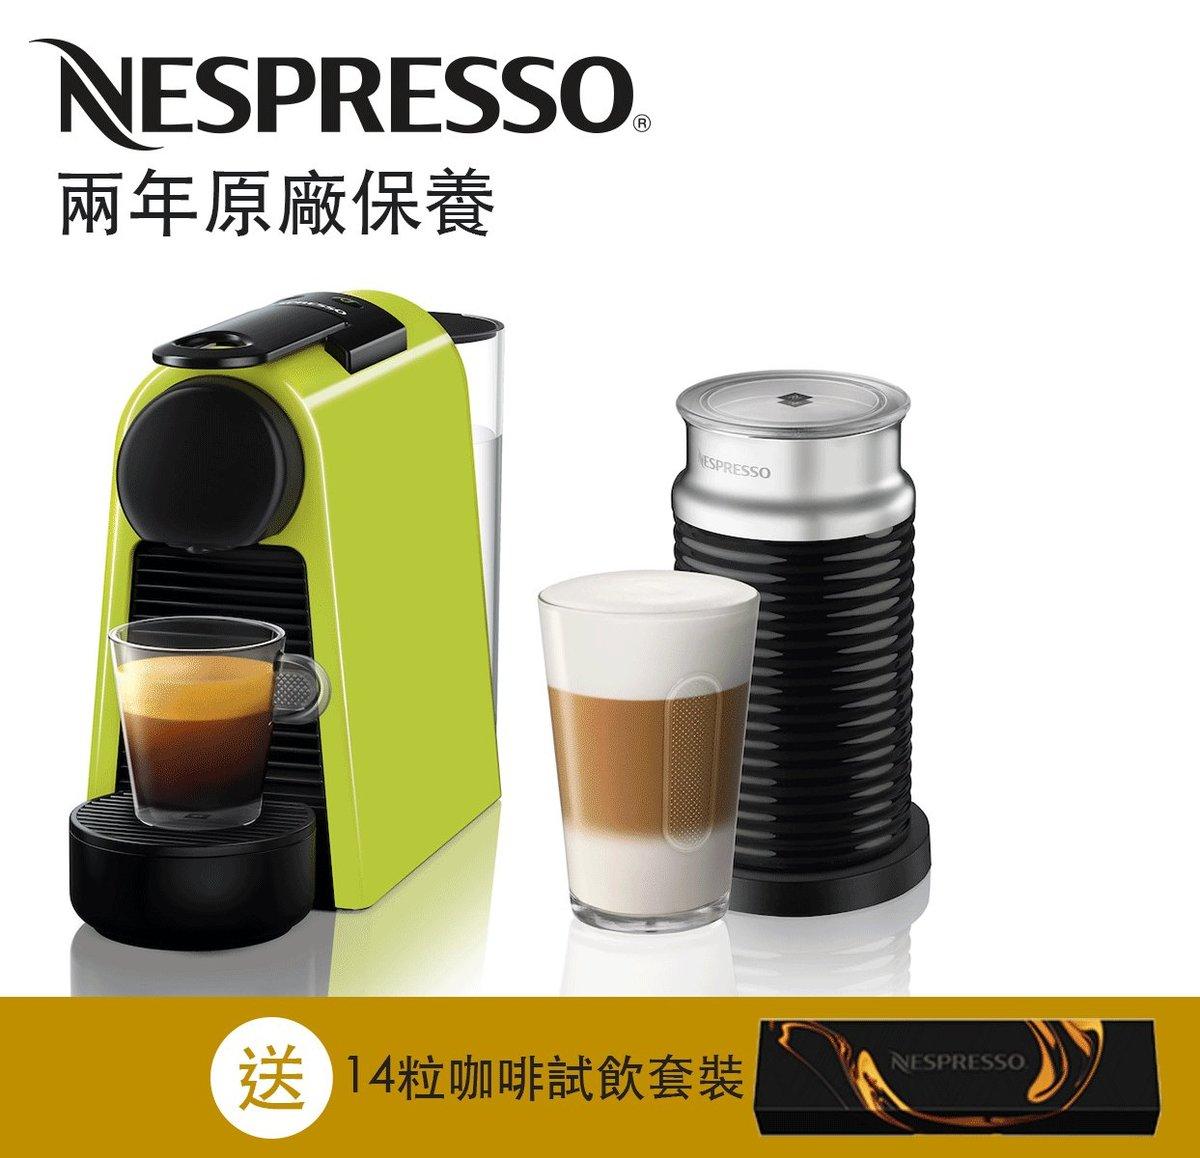 Essenza Mini 咖啡機, 青檸綠色 + Aeroccino3 黑色打奶器